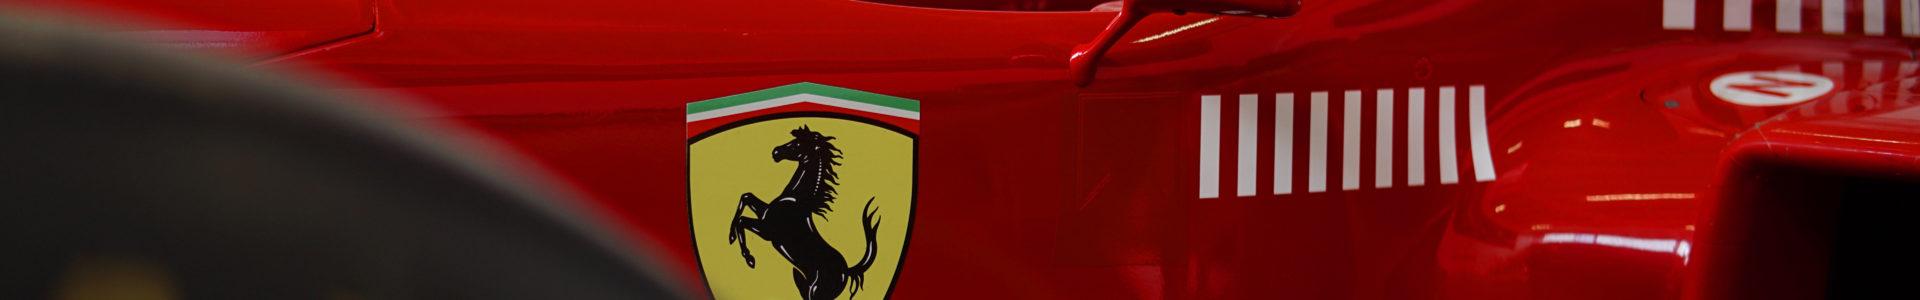 Ferrari – Emozioni senza fine